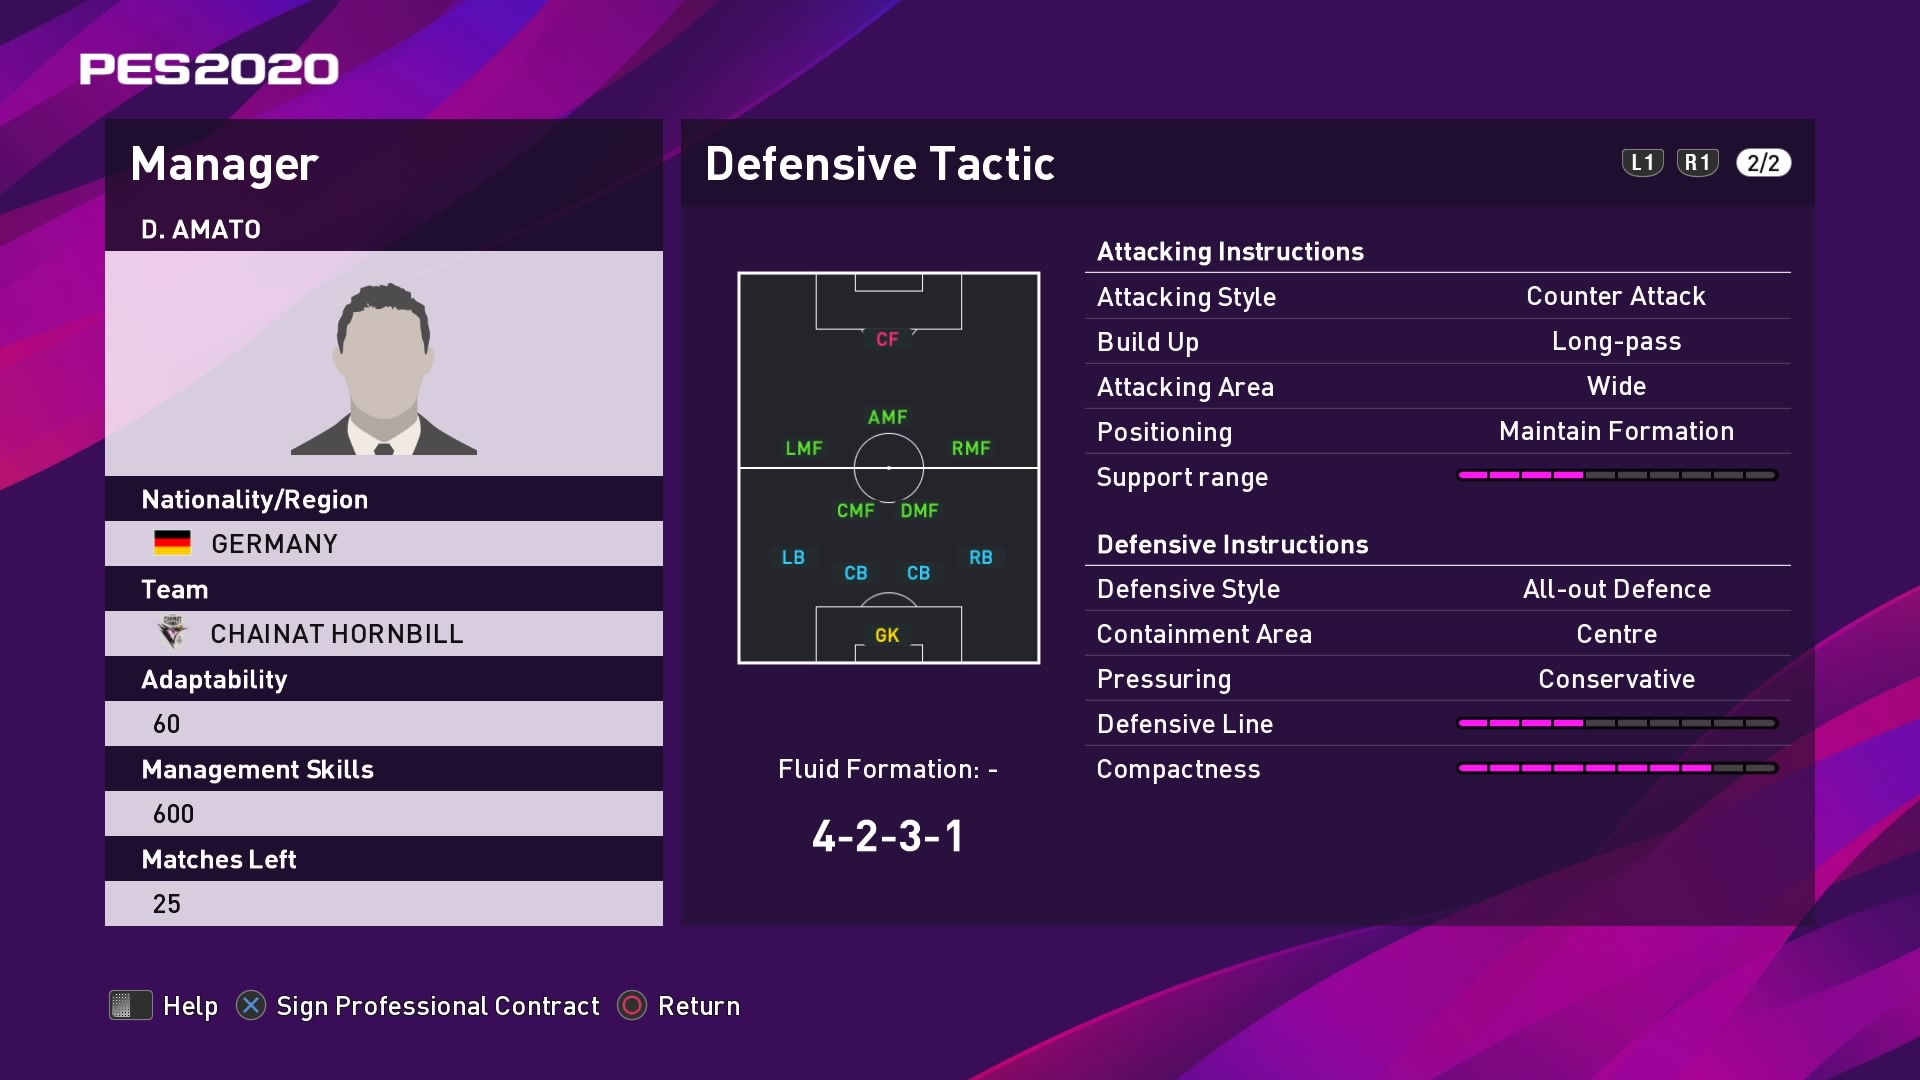 D. Amato (Dennis Amato) Defensive Tactic in PES 2020 myClub